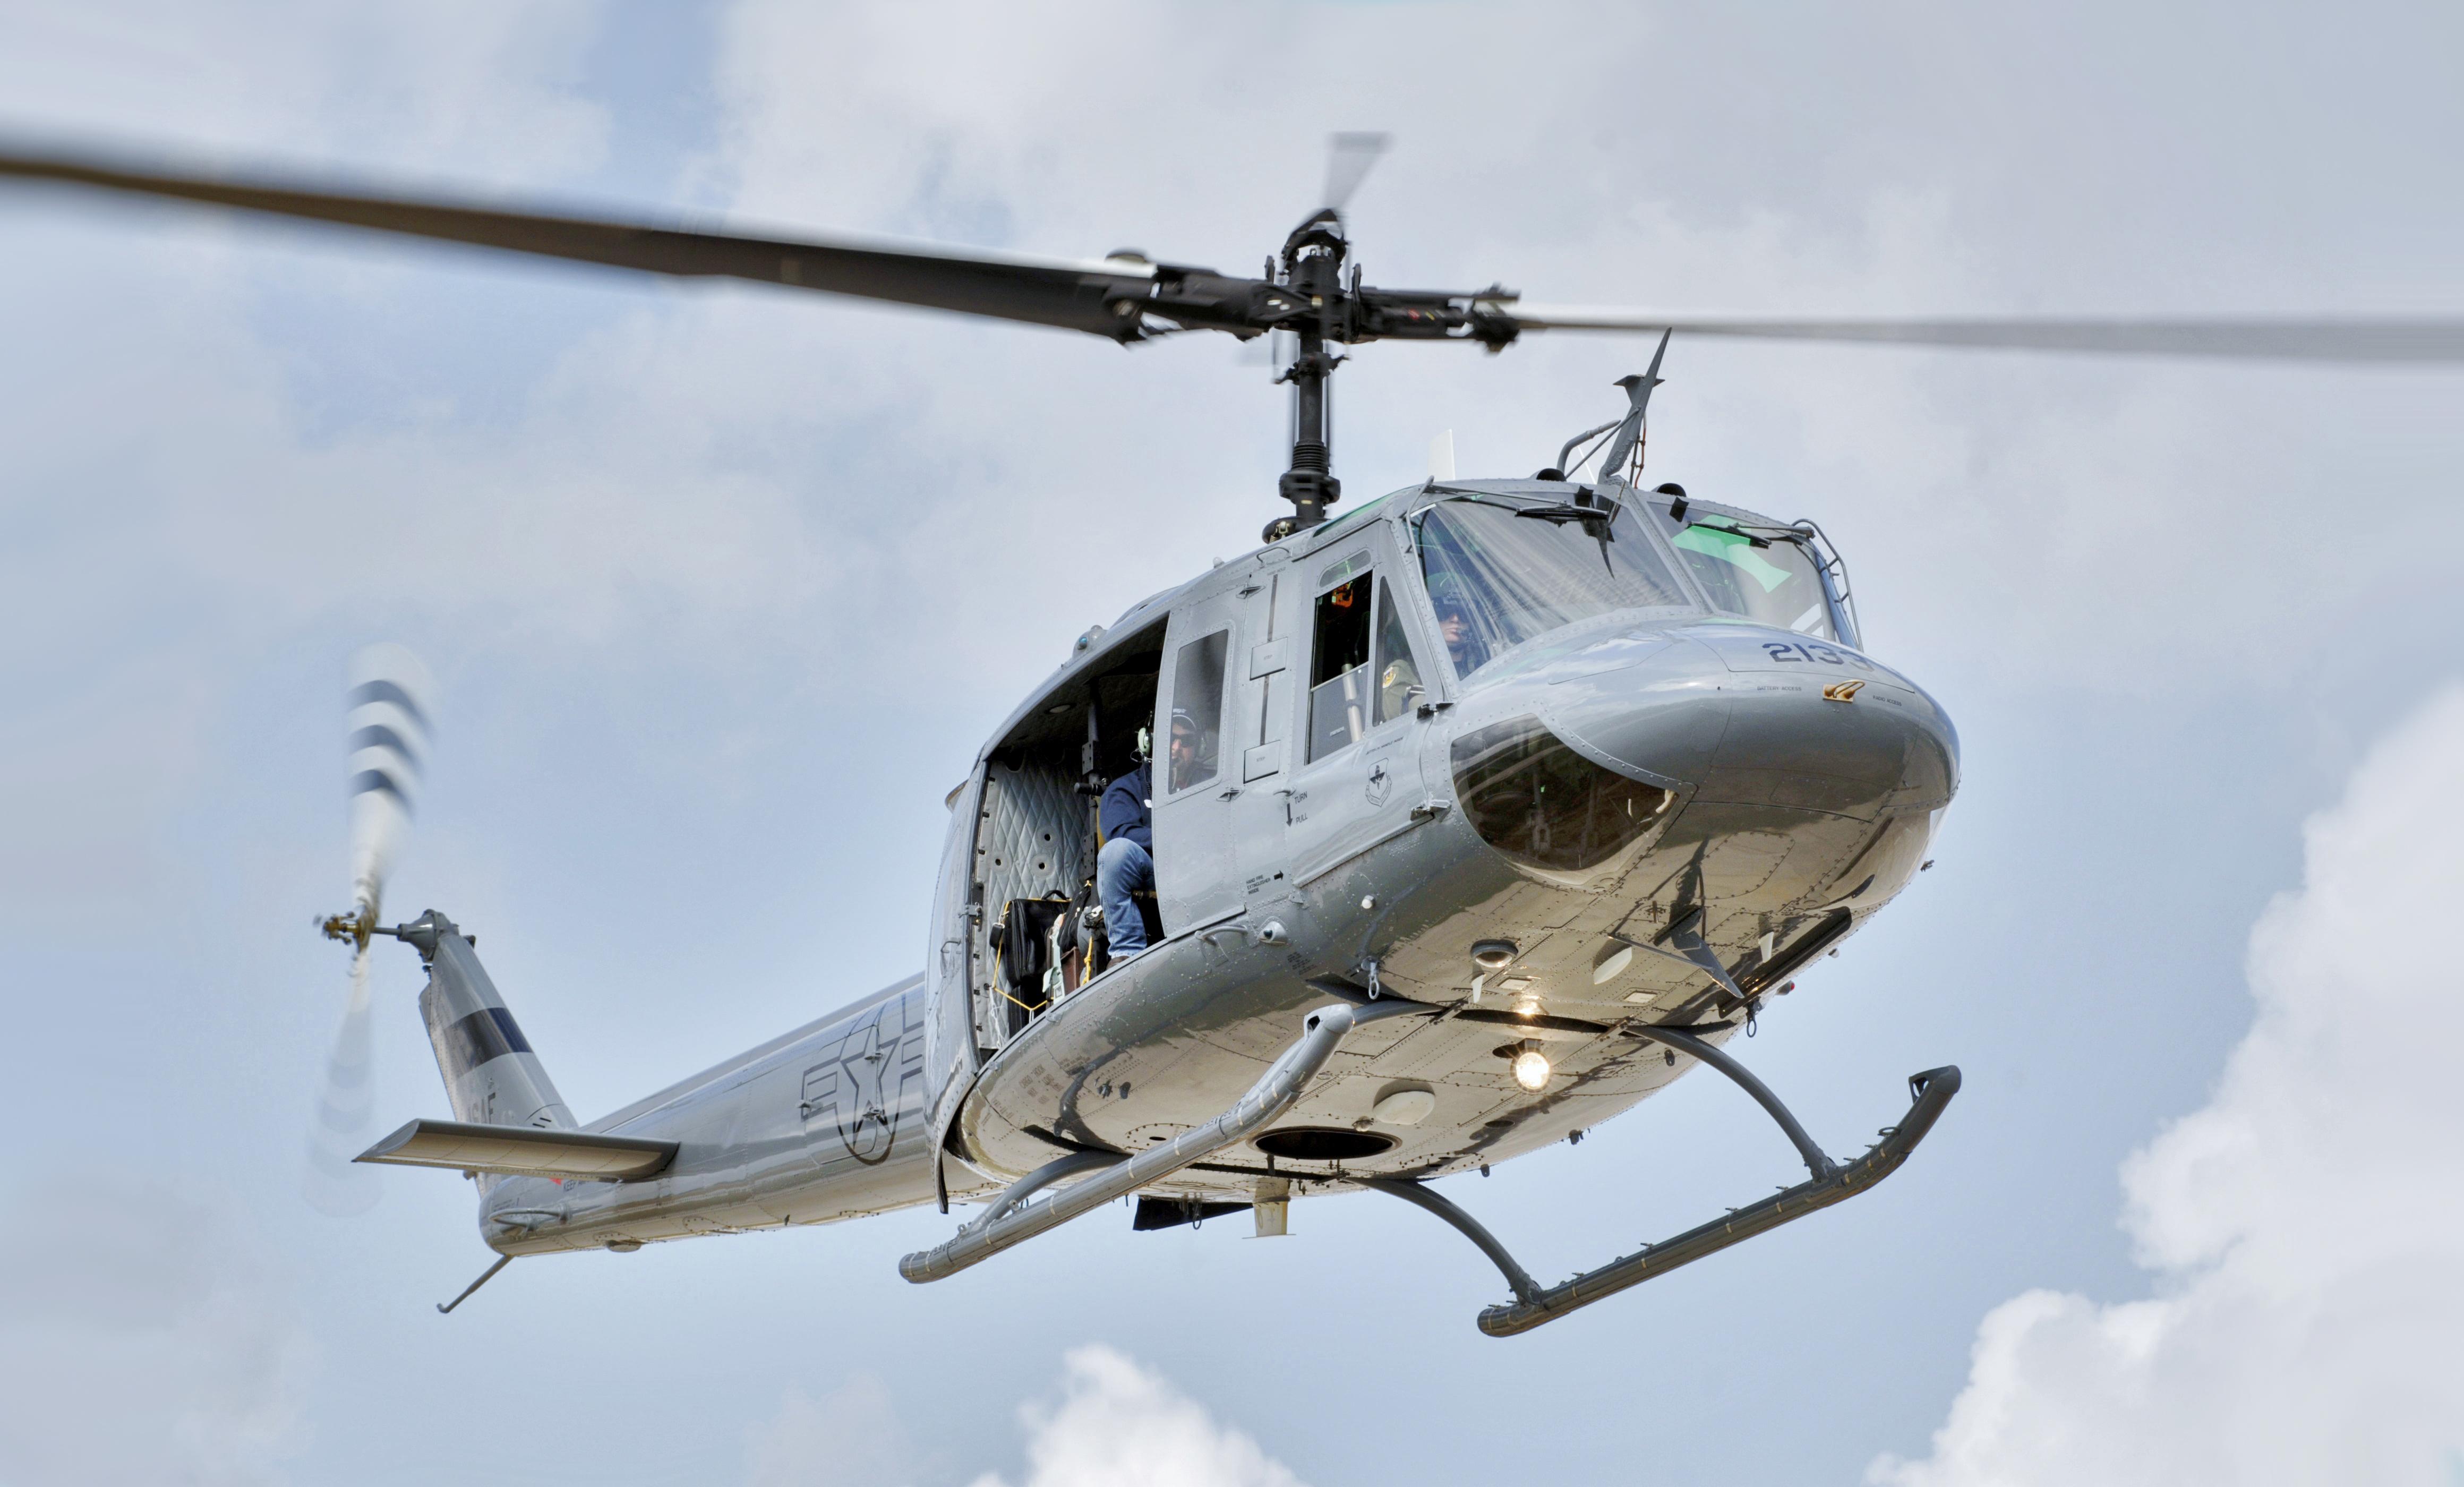 U.S._Air_Force_TH-1_Huey.JPG